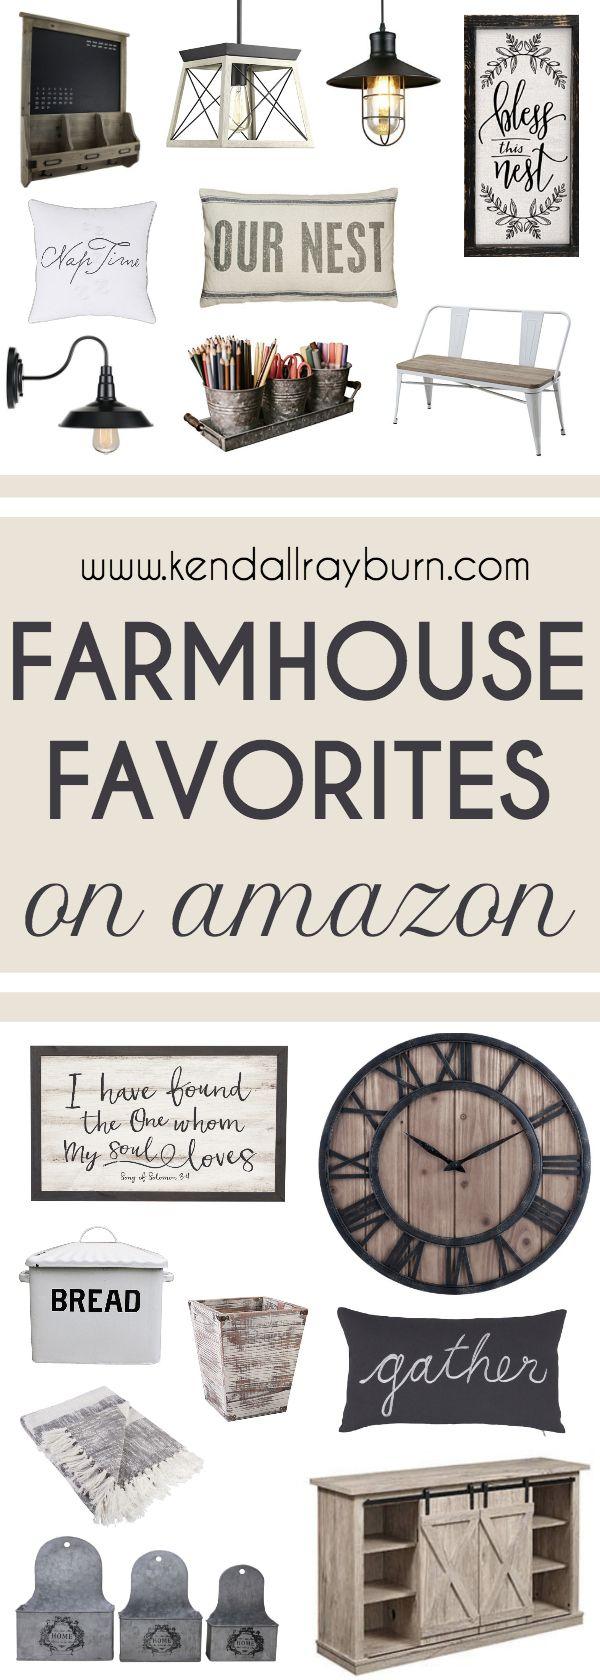 Farmhouse Home Decor on Amazon